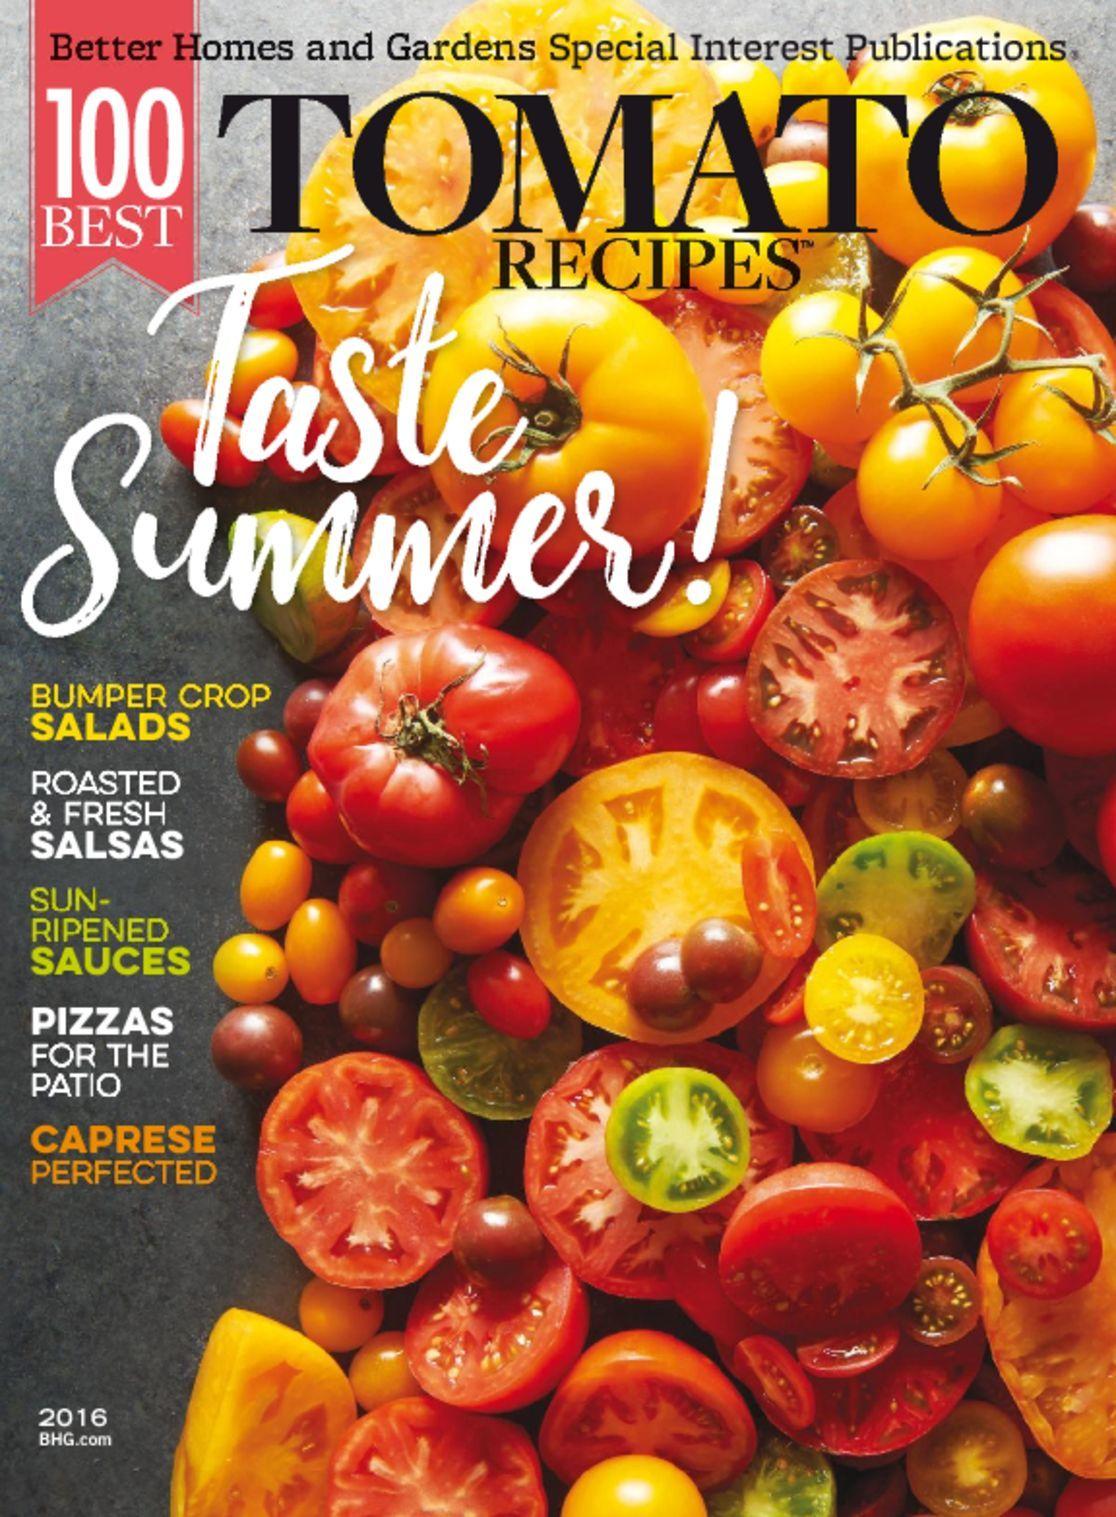 100 Best Tomato Recipes Digital